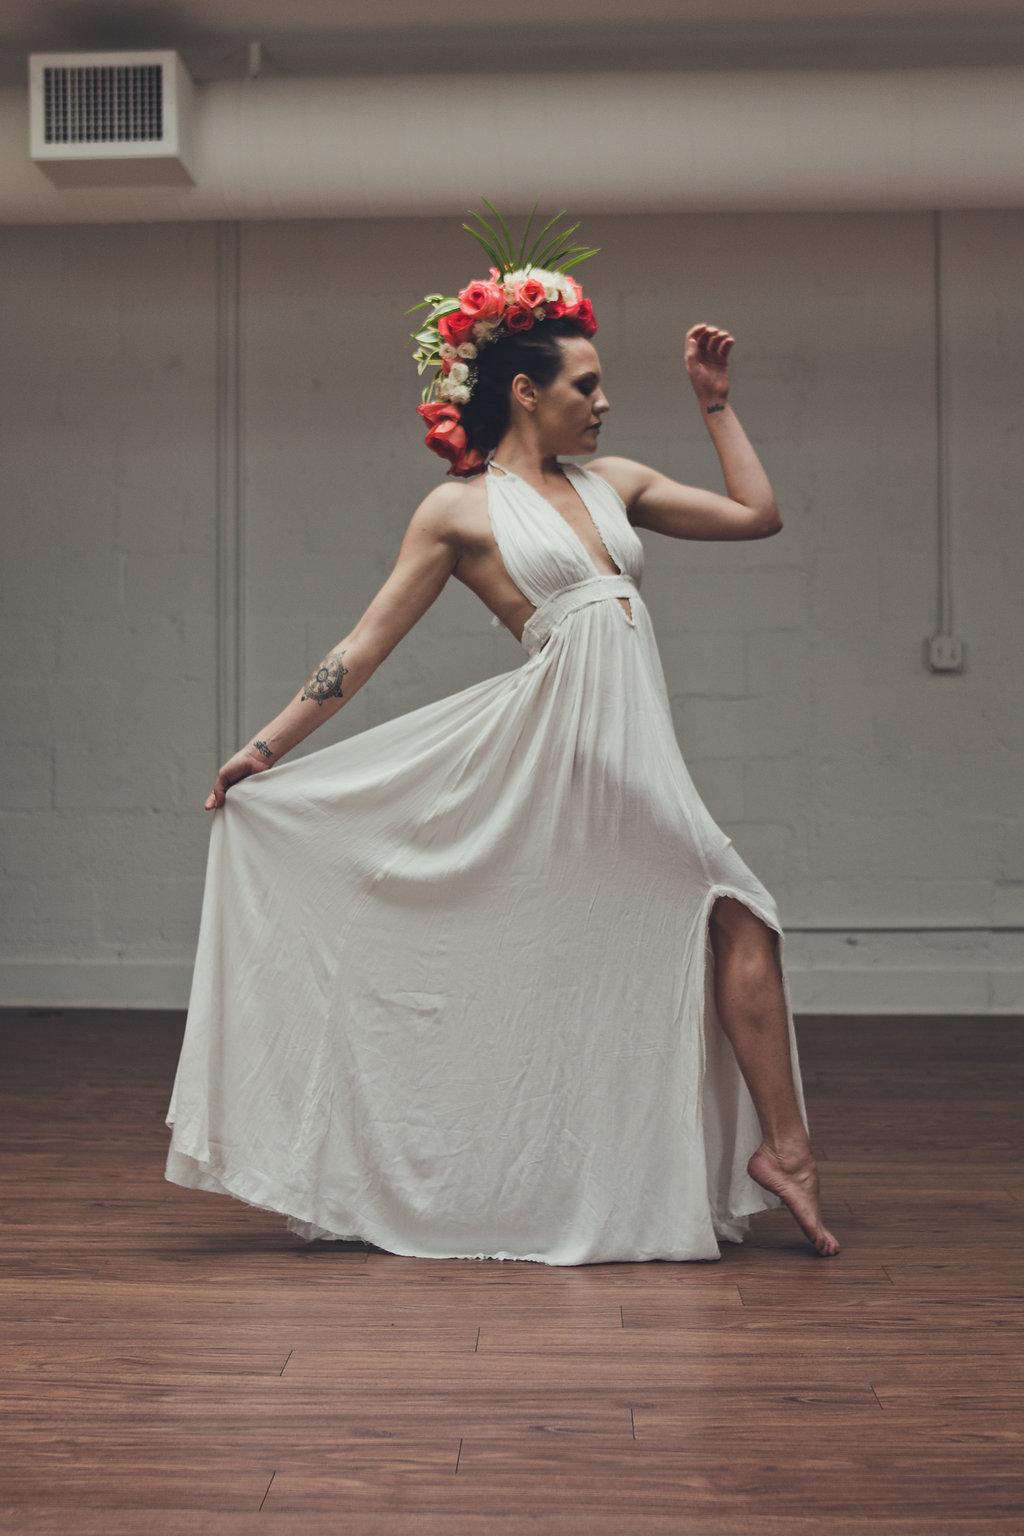 Lisa Rundall Wedding Photography Colorado model with leg forward holding dress skirt